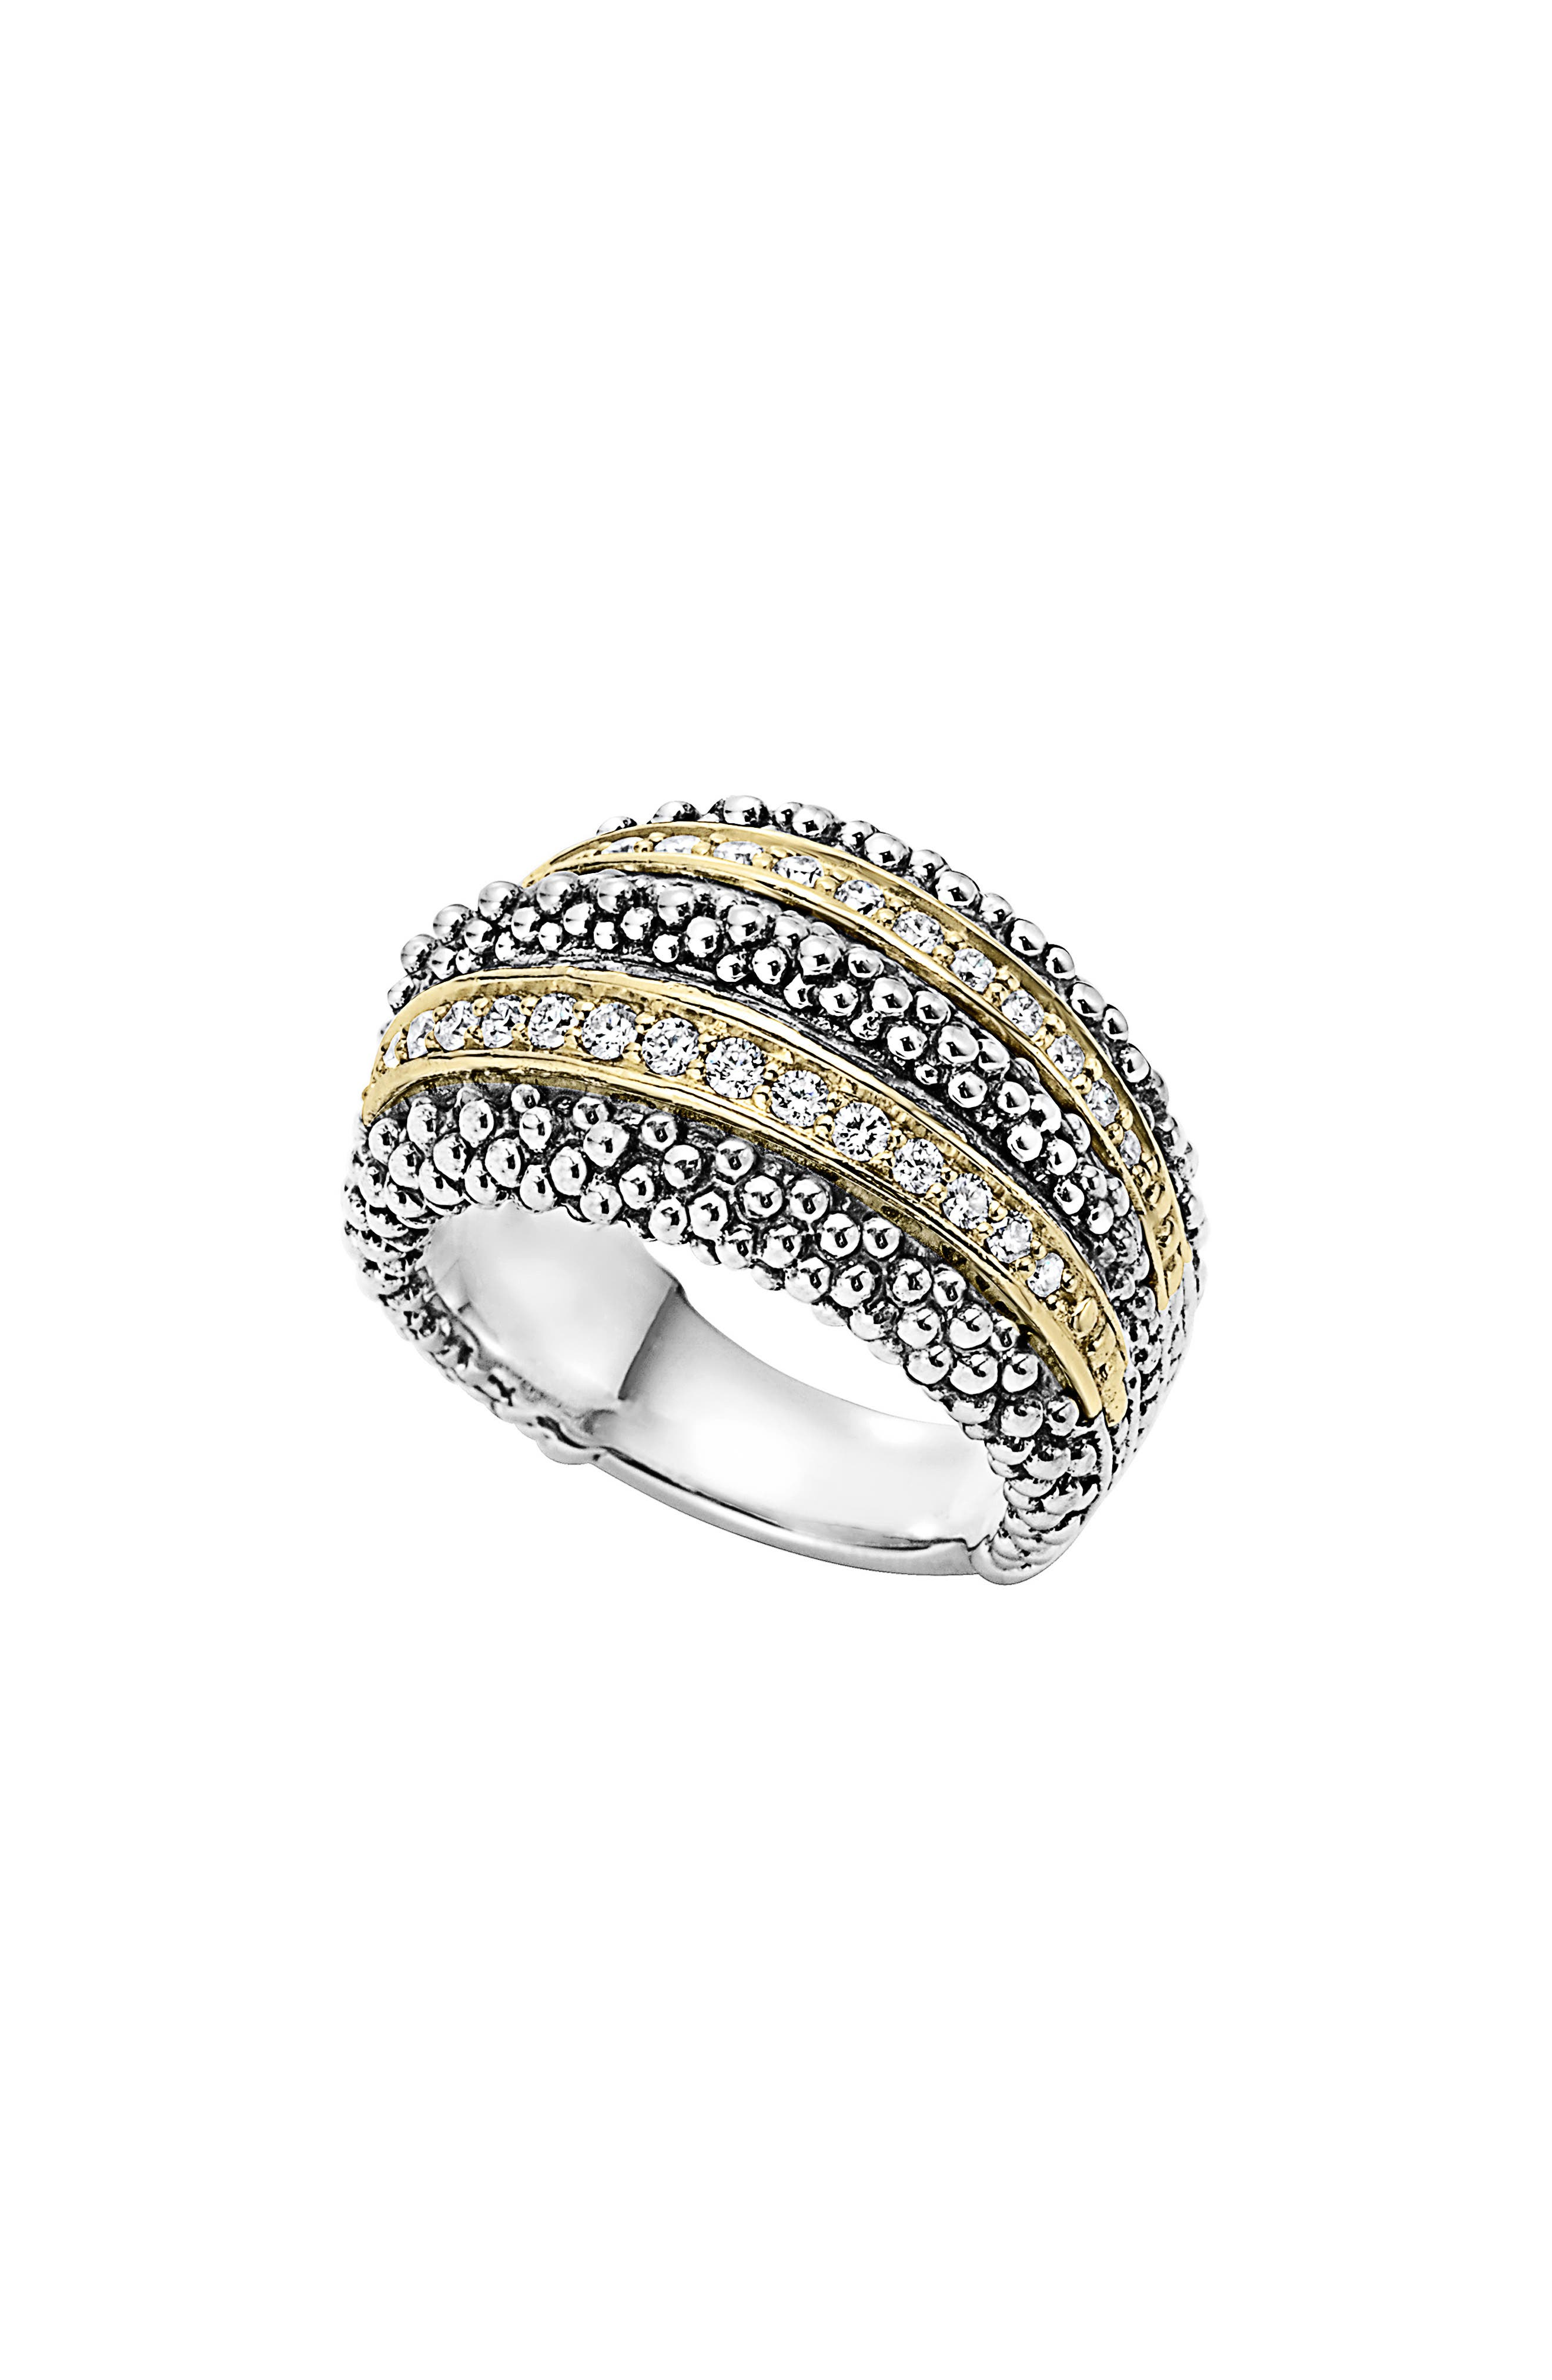 Diamond Caviar Beaded Ring,                         Main,                         color, Silver/ Gold